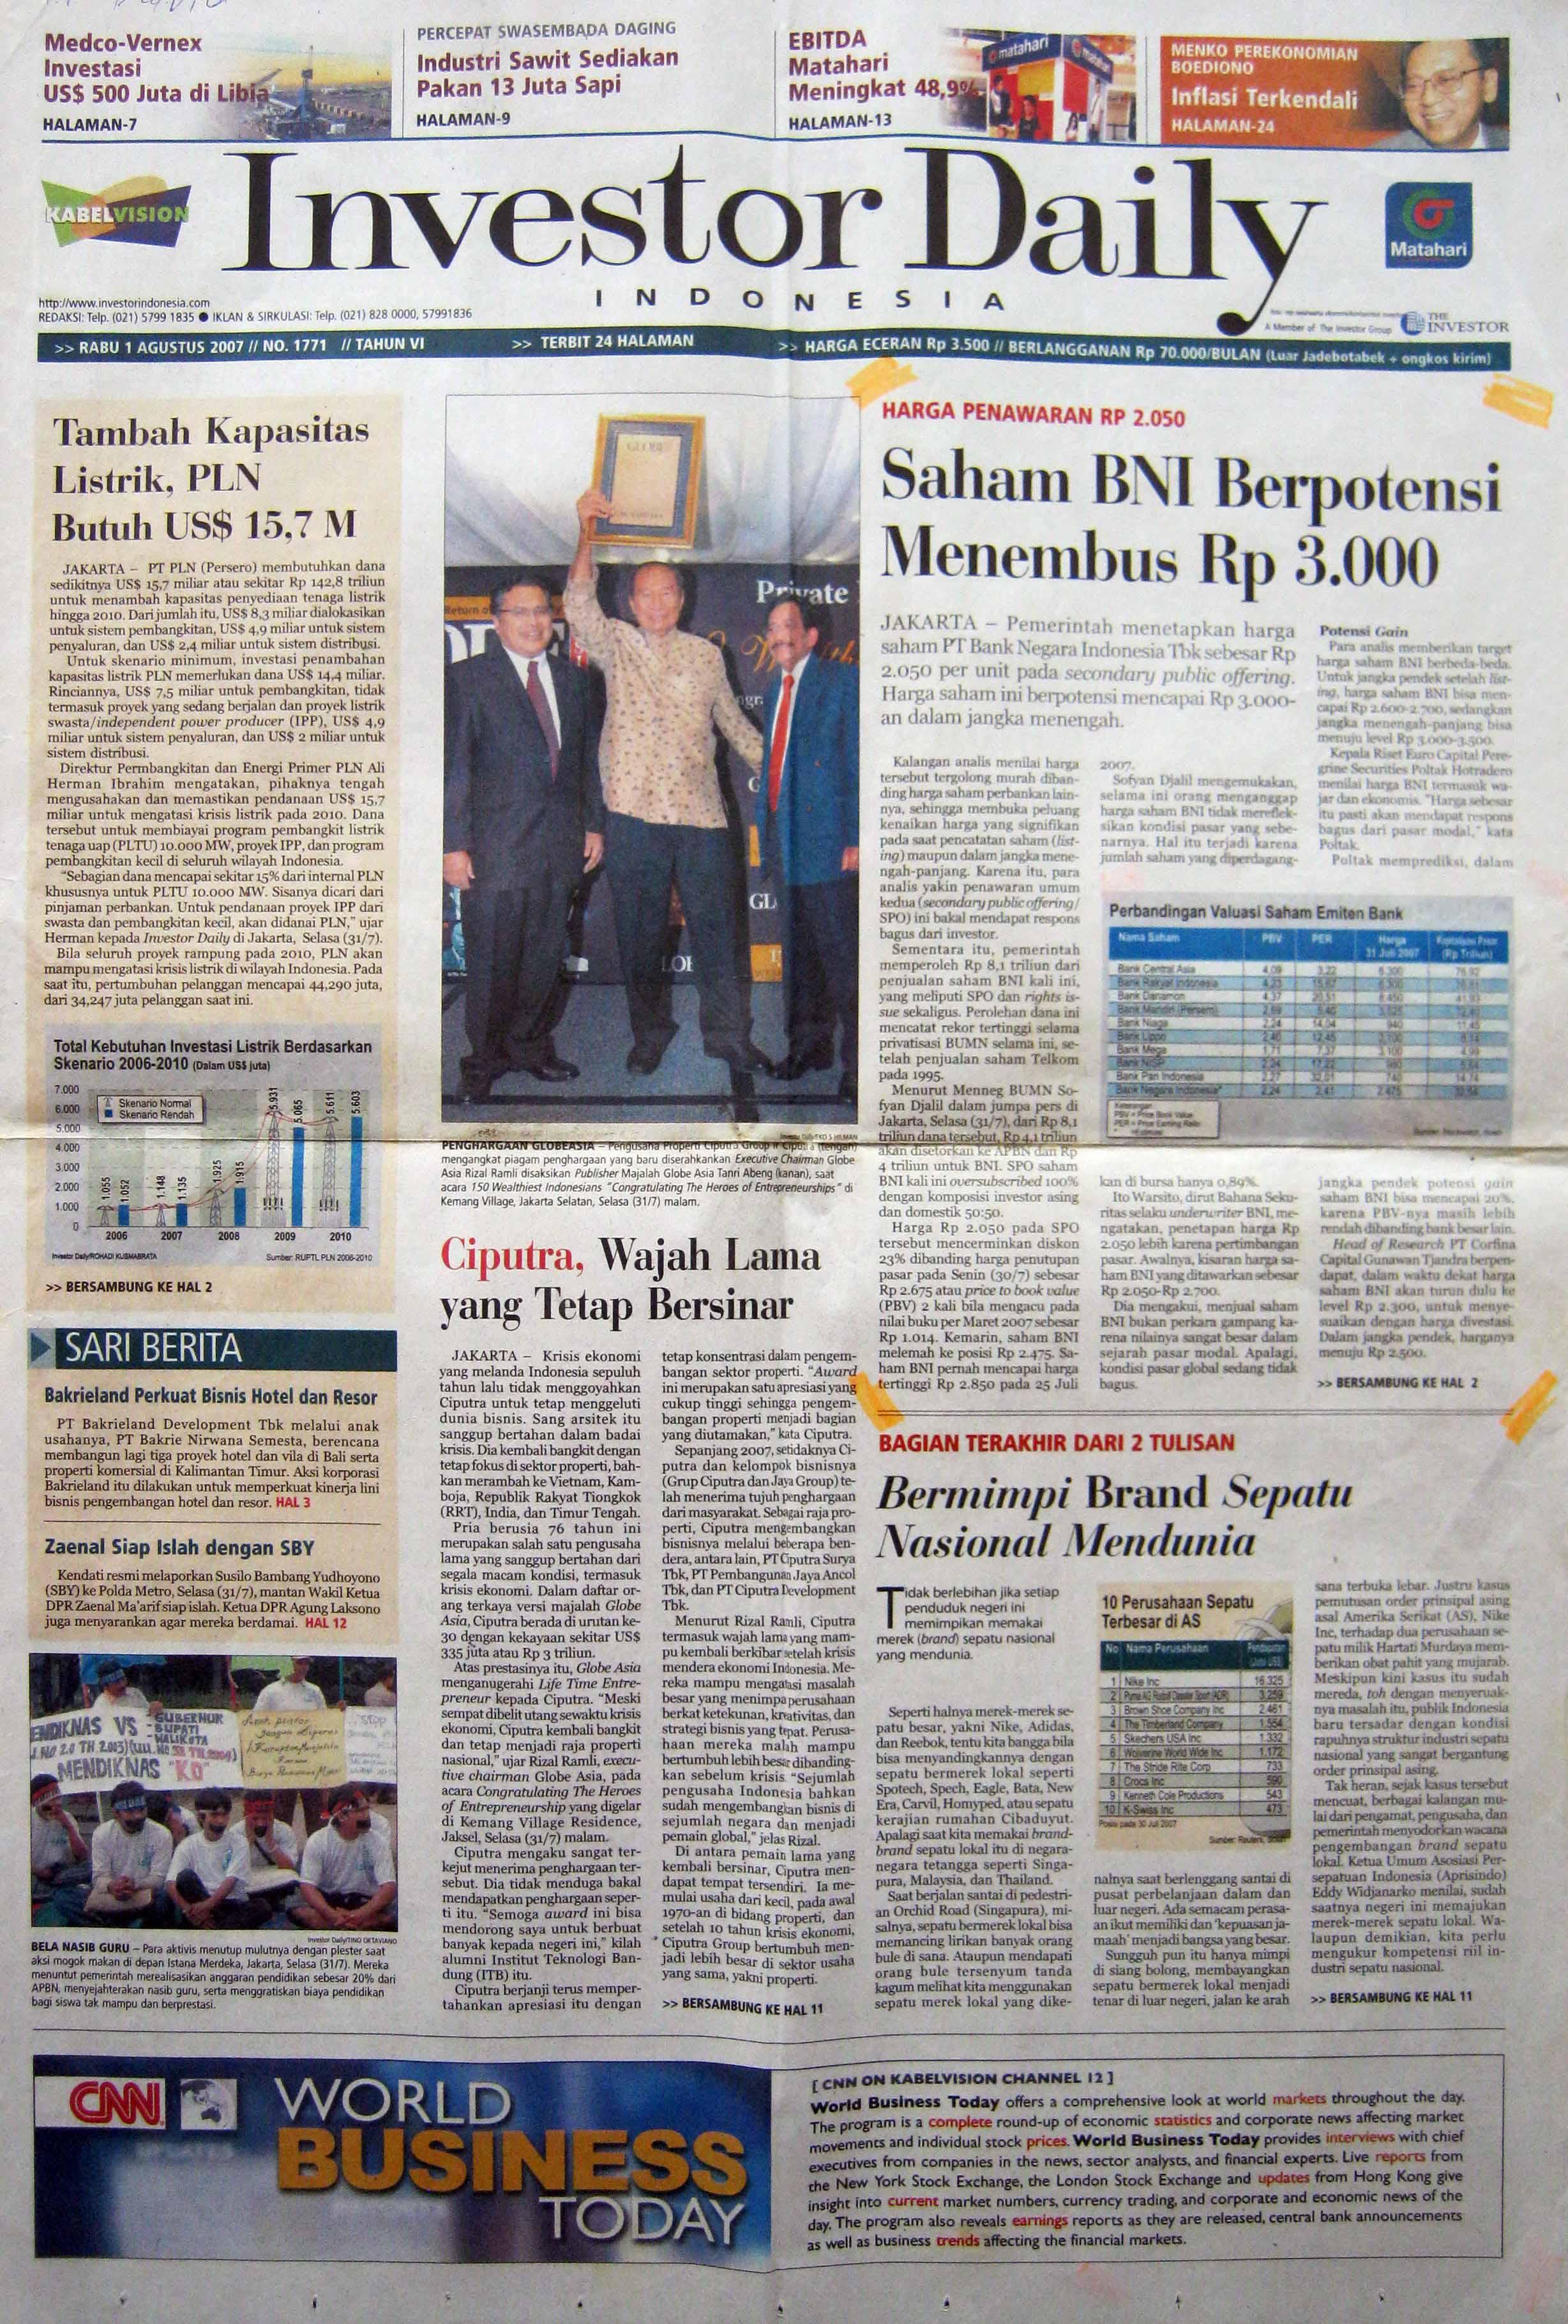 4. 01 Agustus 2007 - Saham BNI Berpotensi Menembus Rp  3.000